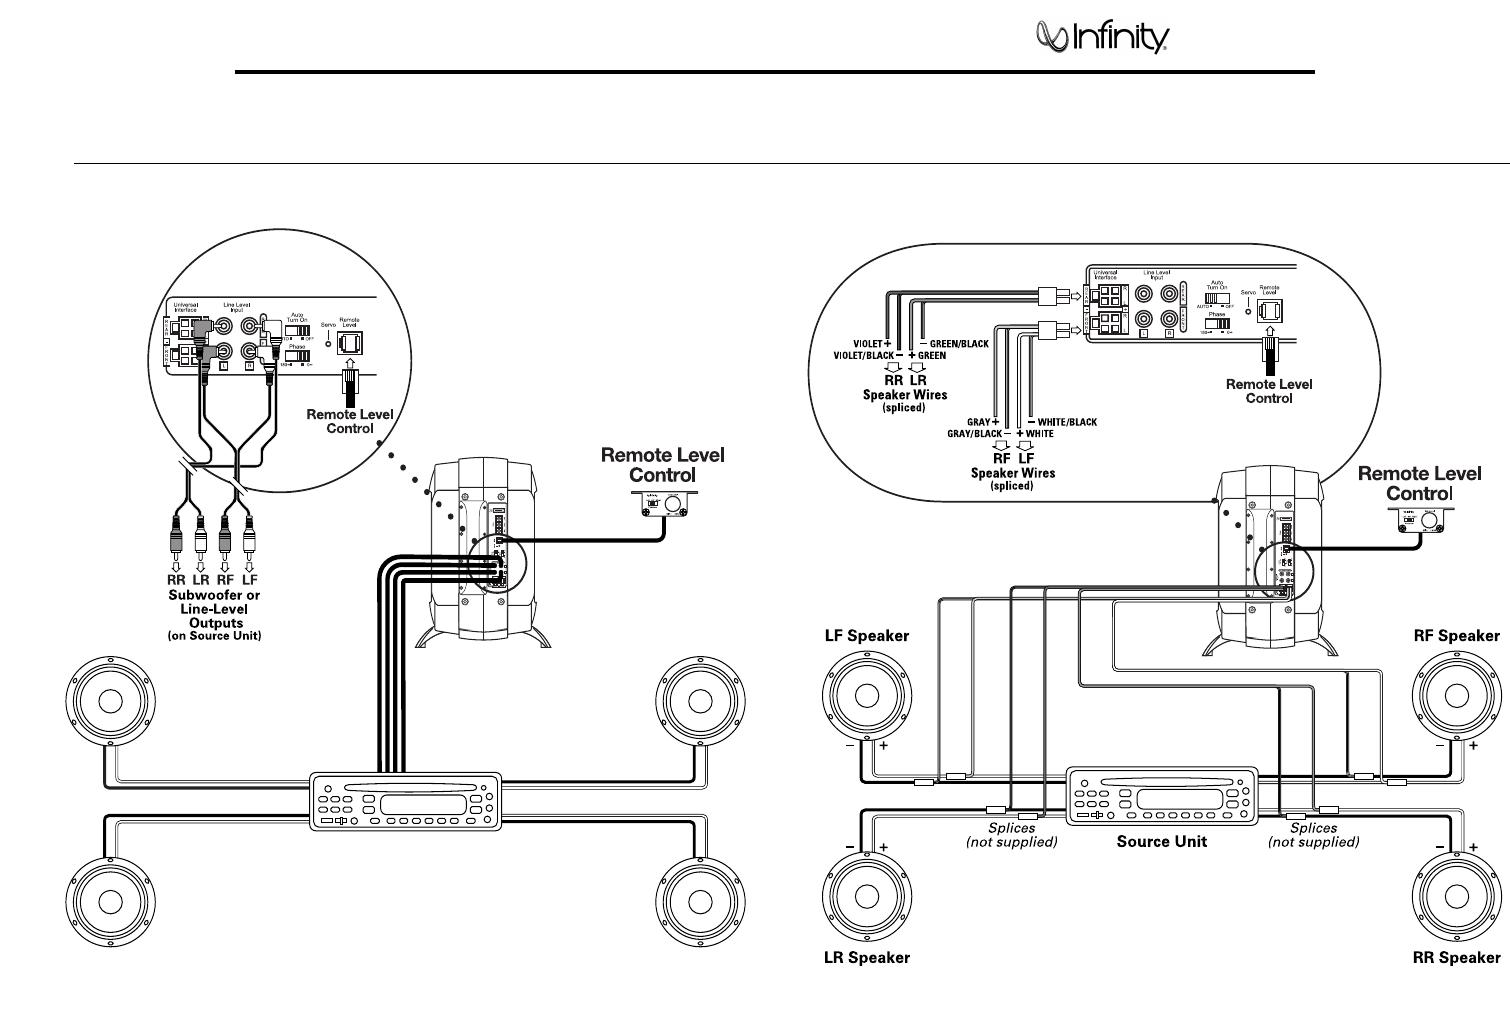 infinity basslink wiring diagram 28 images infinity basslink 10 rh december19 us